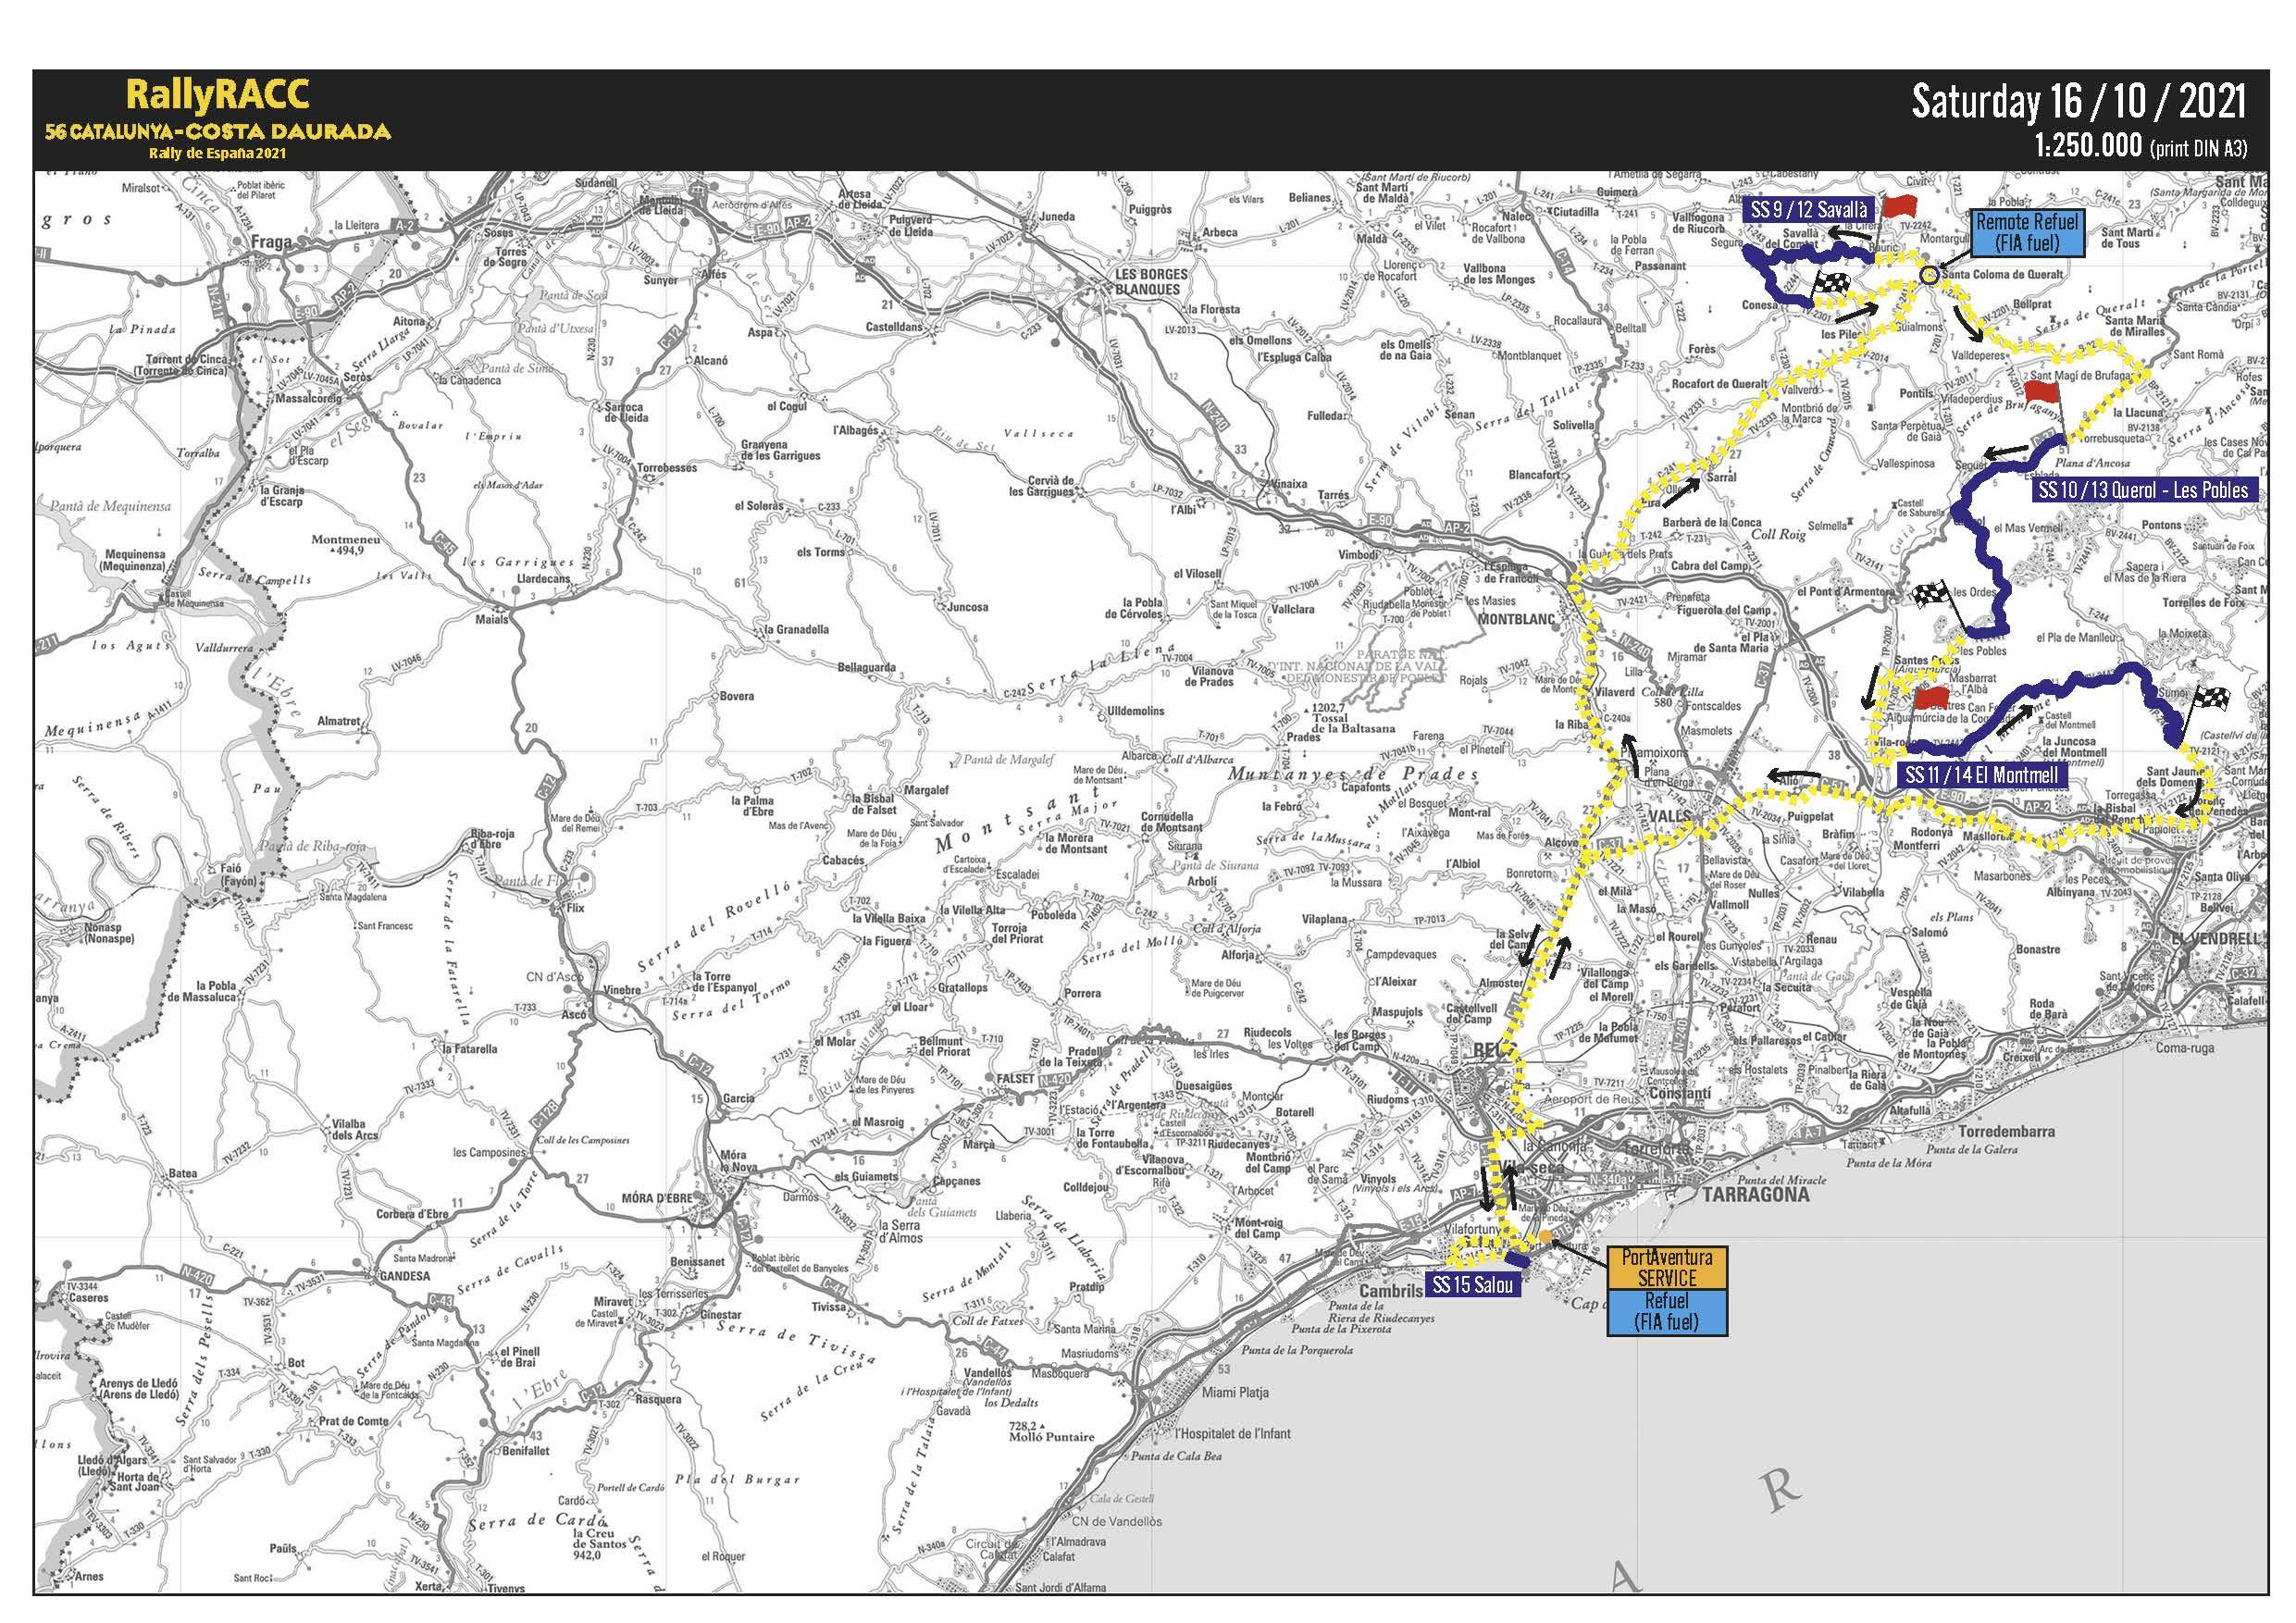 World Rally Championship: Temporada 2021  - Página 31 Etapa2